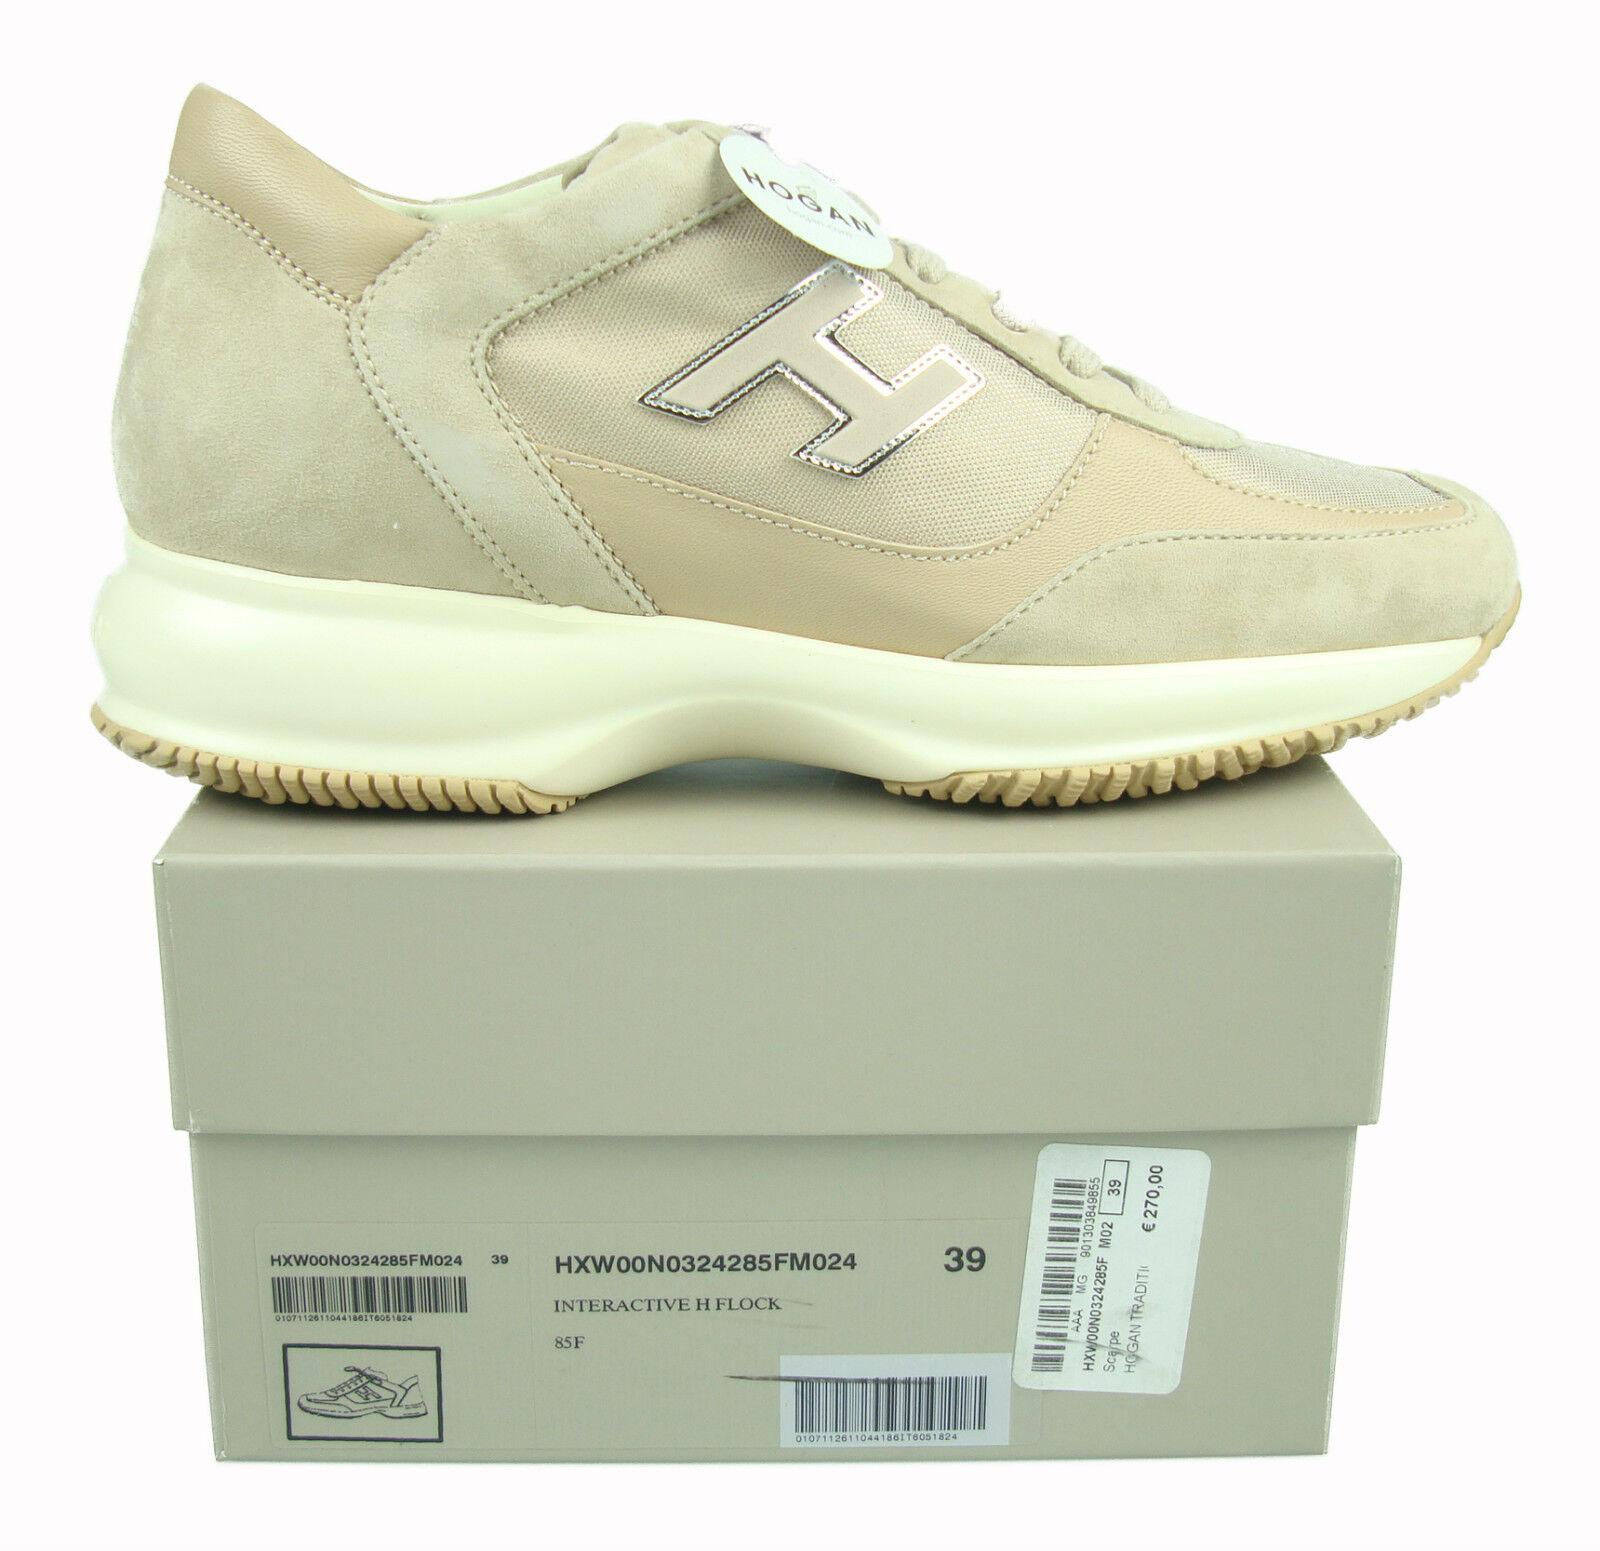 HOGAN Interactive h-Herde Schuhe Frauen Schuhe damenshuhe damenshuhe damenshuhe Frauen neu 100%Authent cd5898